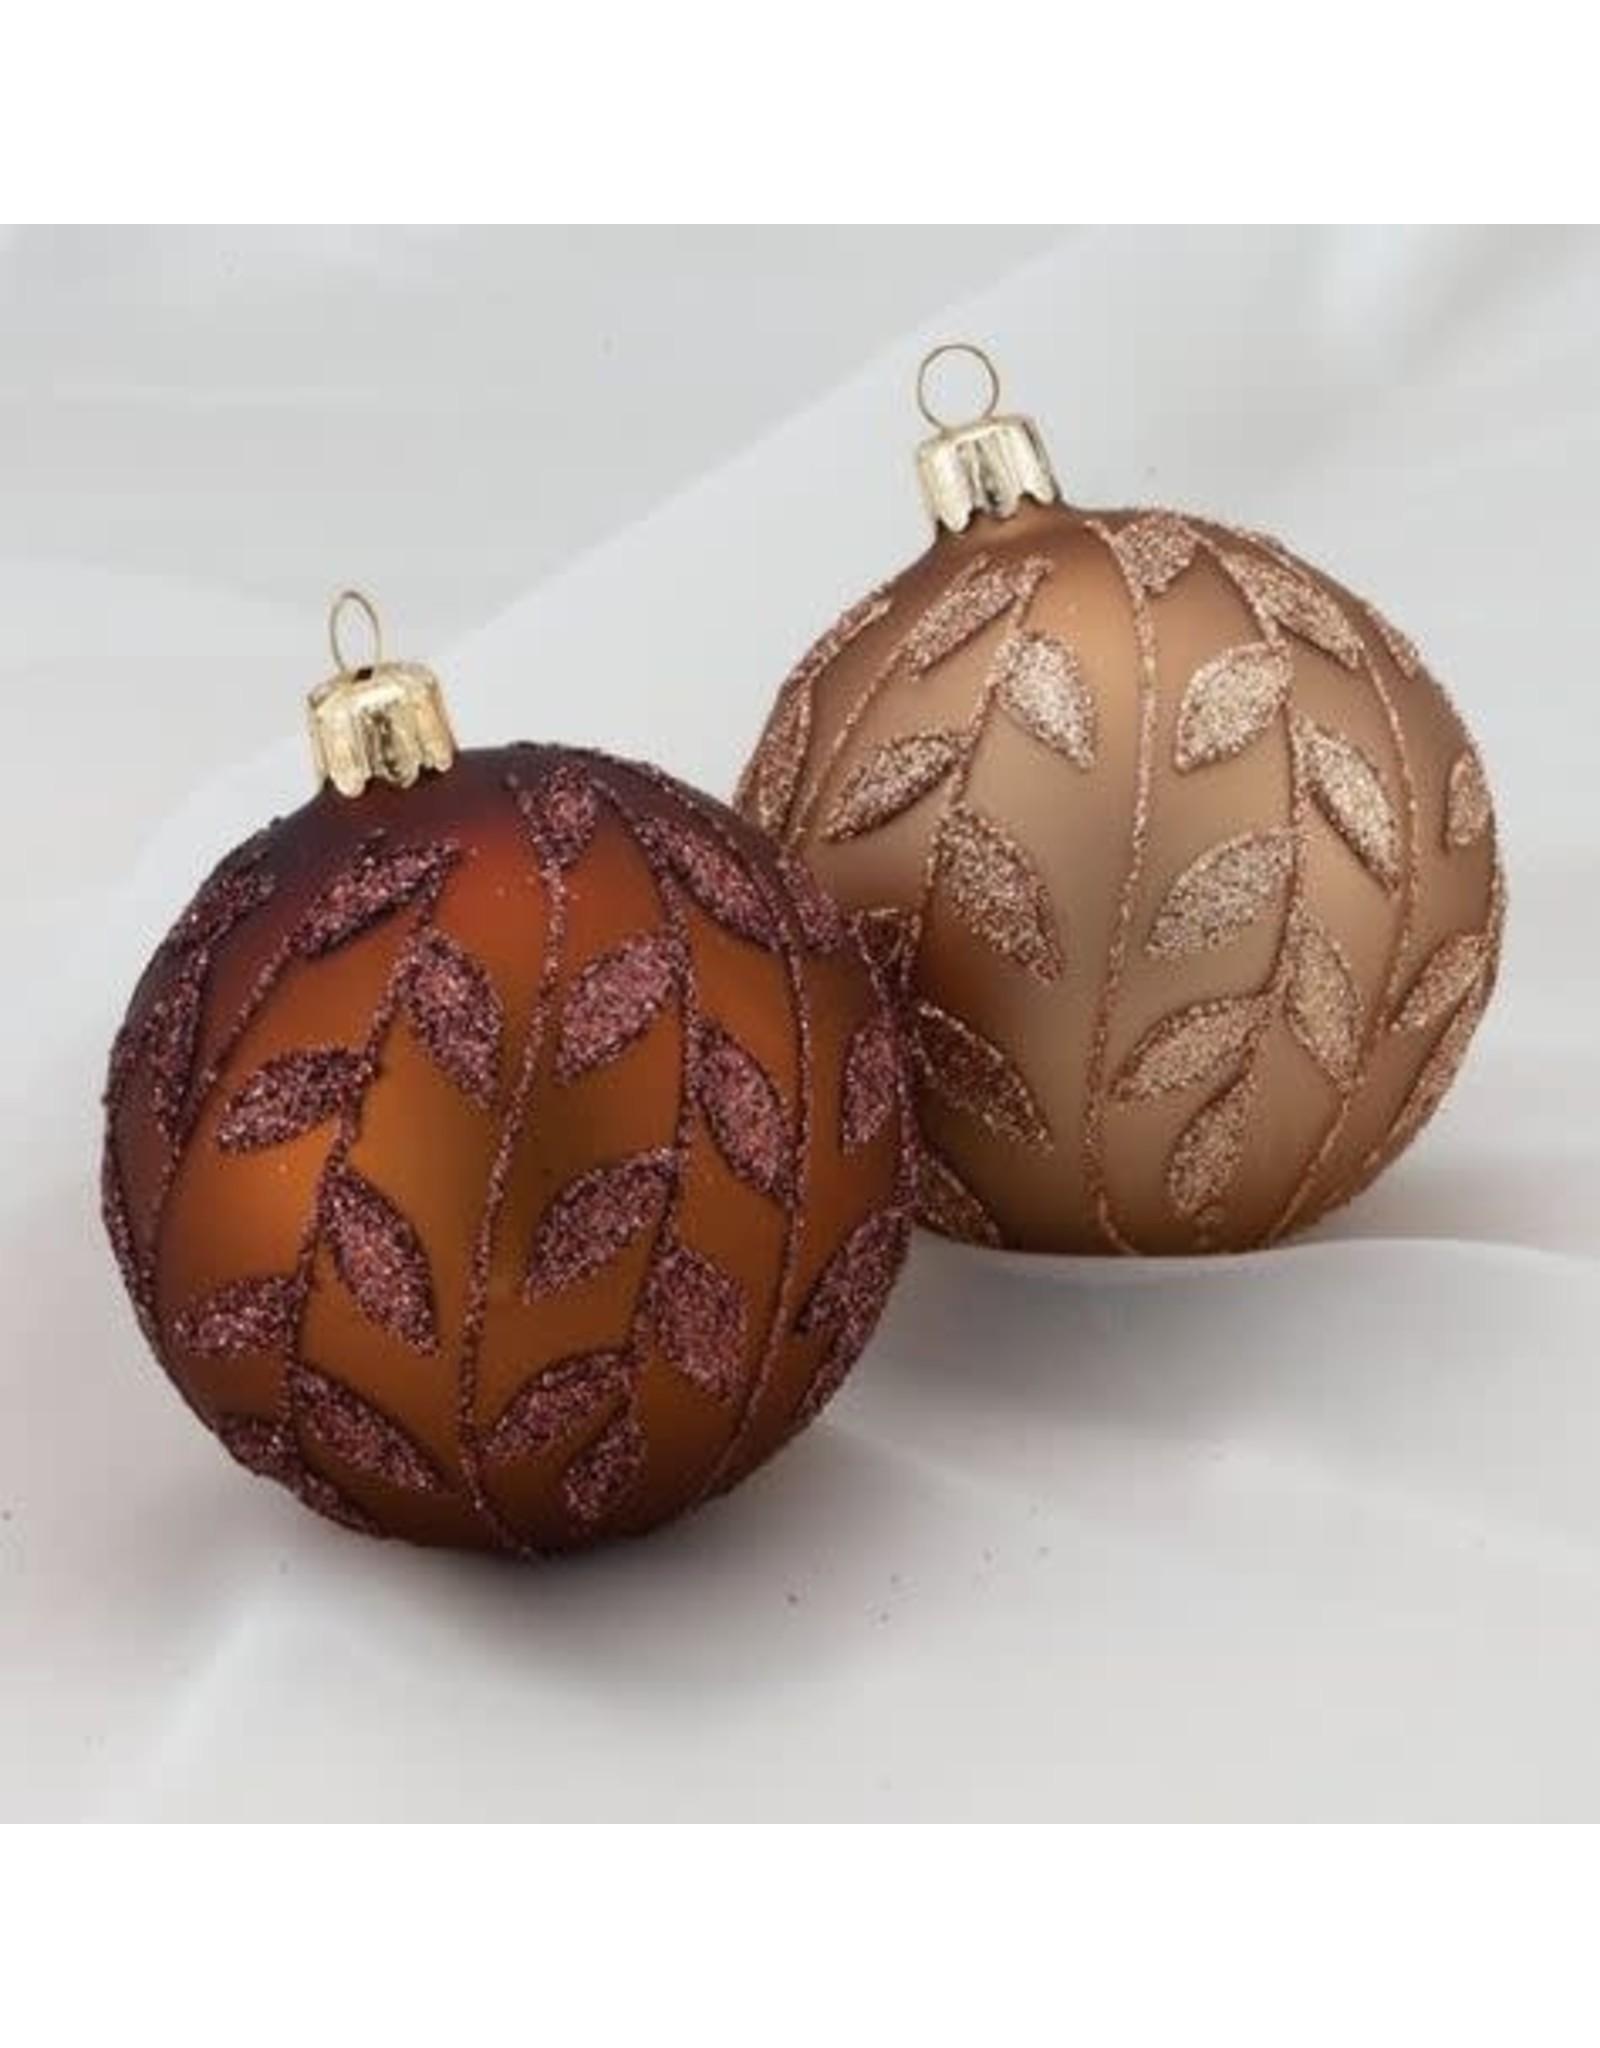 Kurt Adler 2-Tone Brown Glitter Leaf Ball Ornaments 4ct